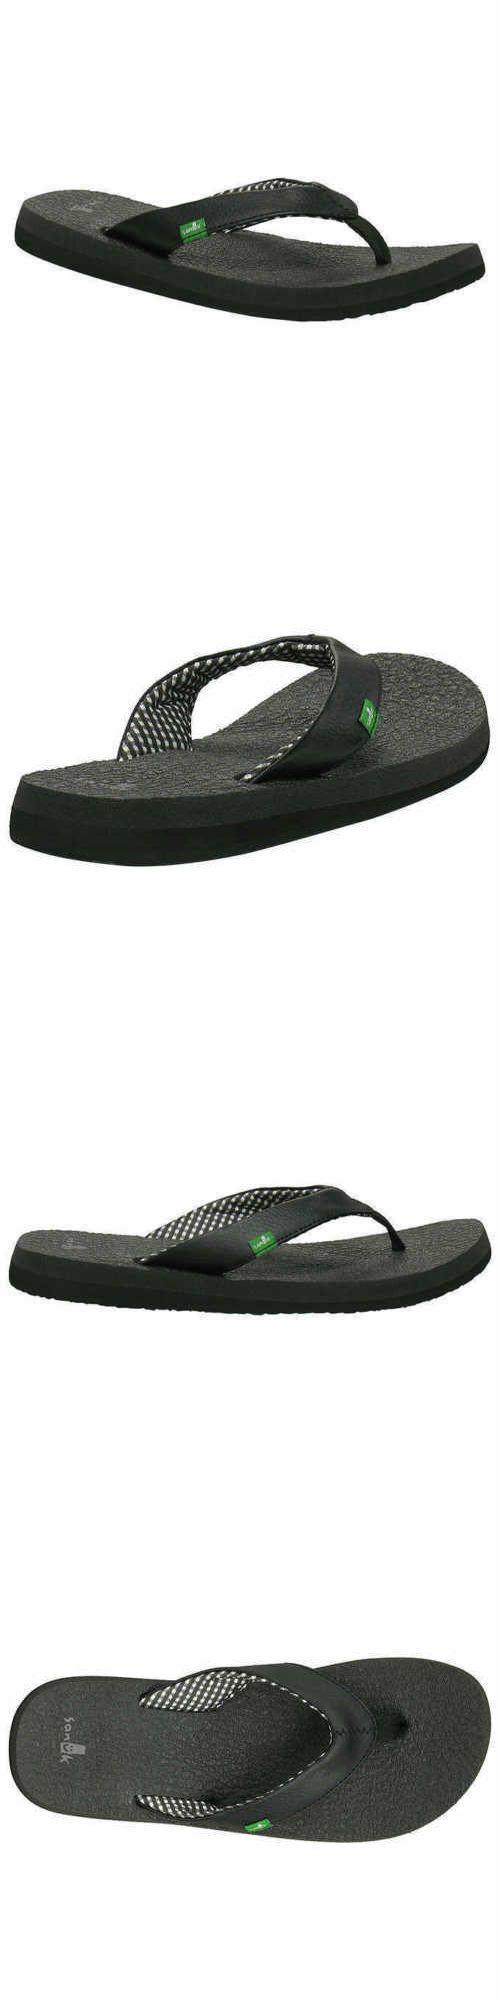 3af042620b5d37 Sandals 62107  Sanuk Ladies Yoga Mat Flip Flops ~ Black ~ Various Sizes ~  Wow ! ! ! -  BUY IT NOW ONLY   19.9 on  eBay  sandals  sanuk  ladies  flops   black ...